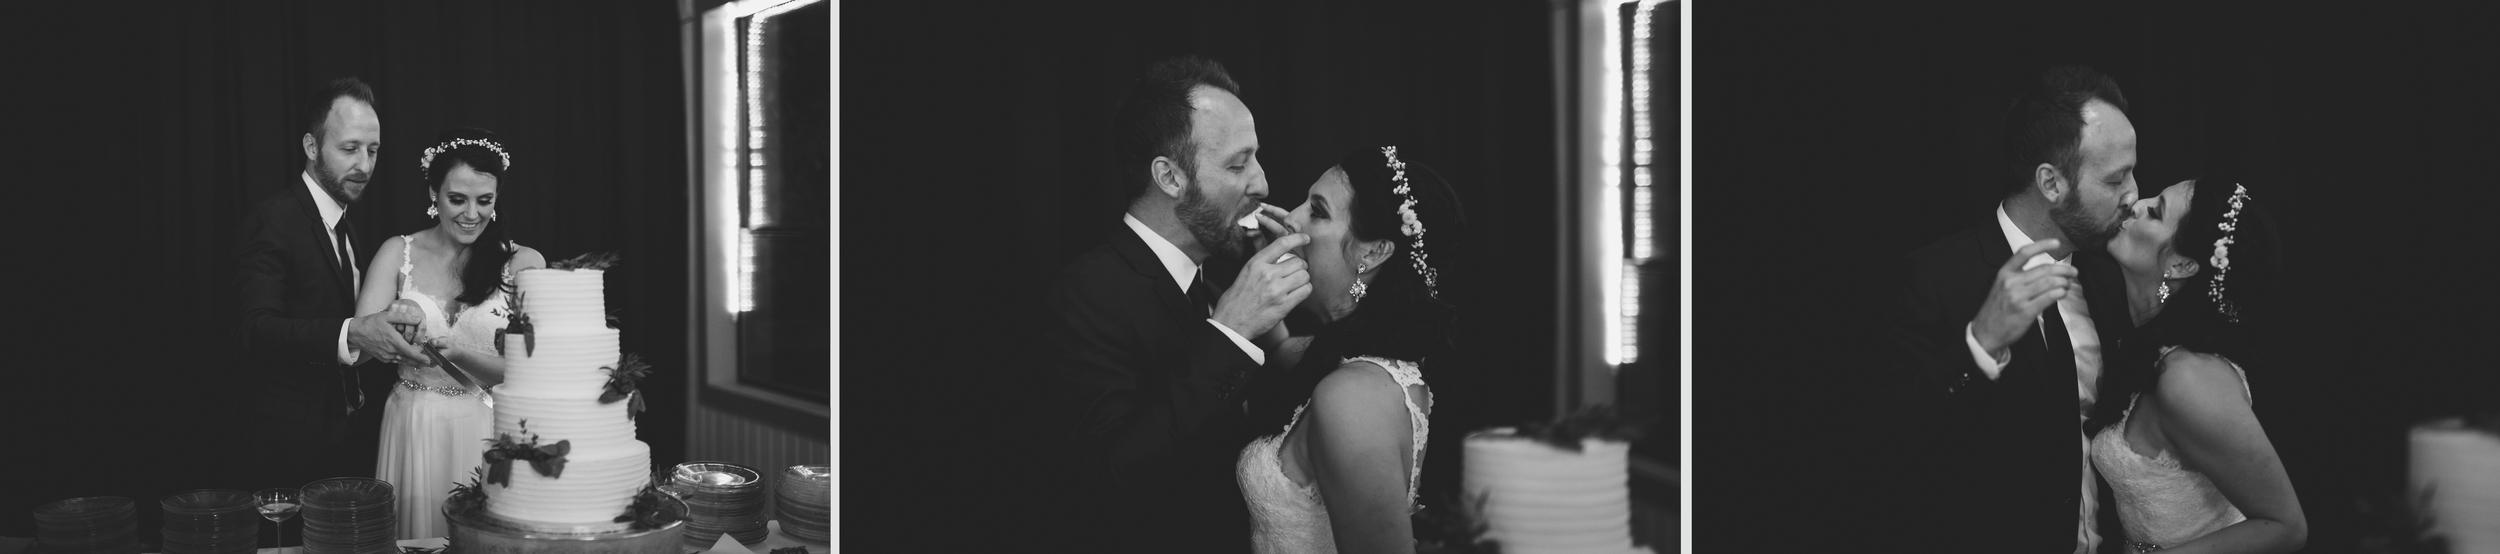 austin texas wedding photographer00665 copy.jpg